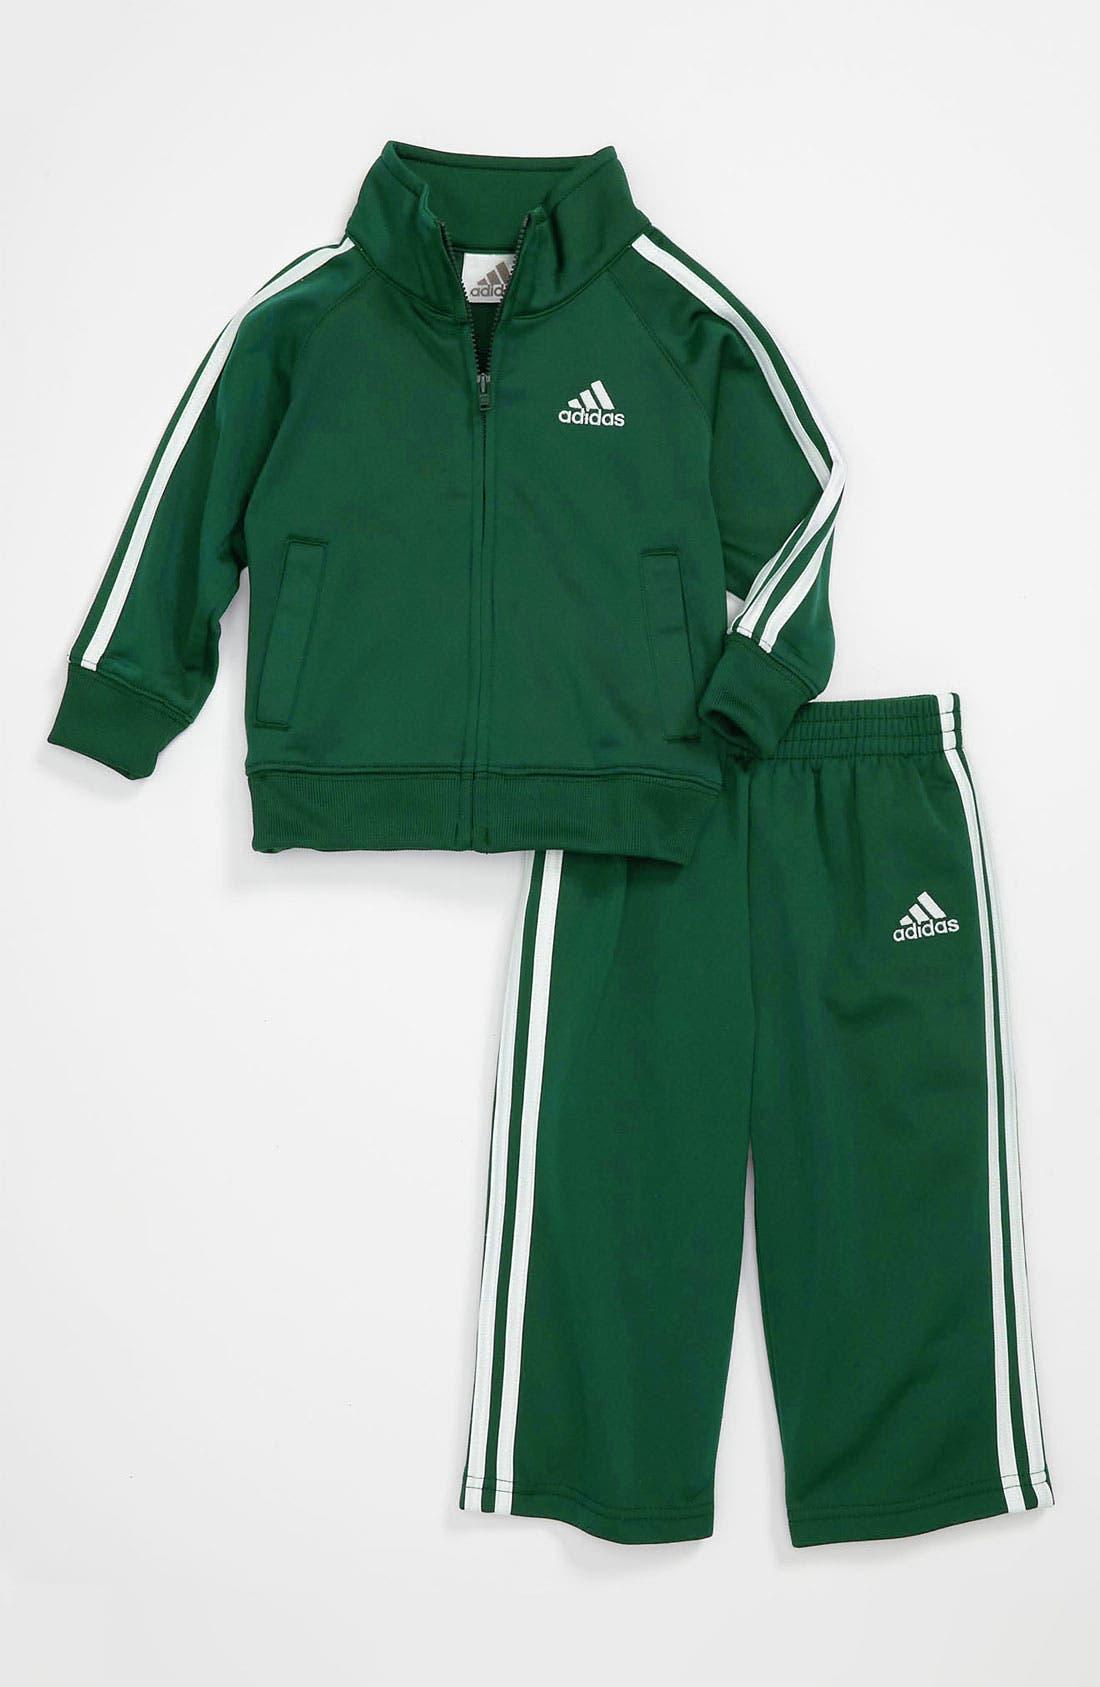 Main Image - adidas 'Icon Tricot' Jacket & Pants (Infant)